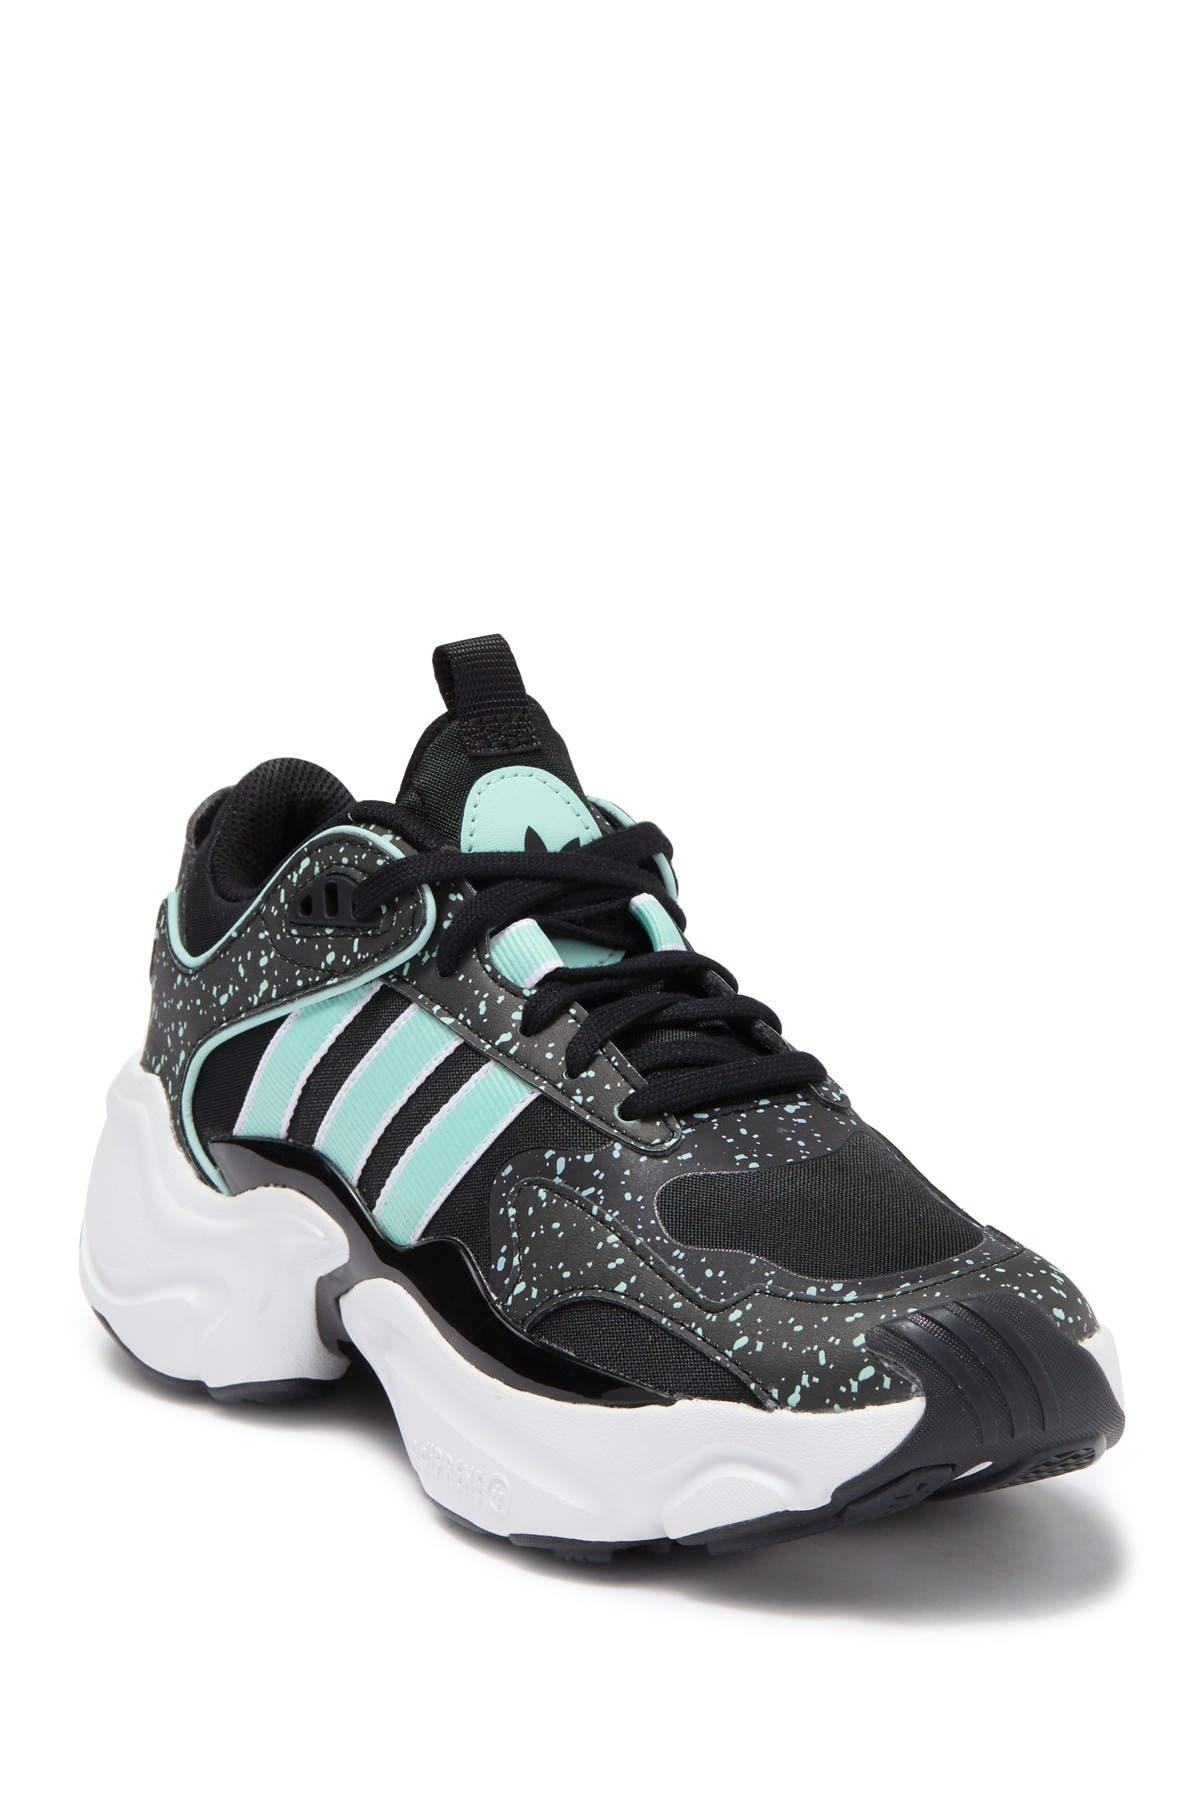 adidas magmur running sneaker